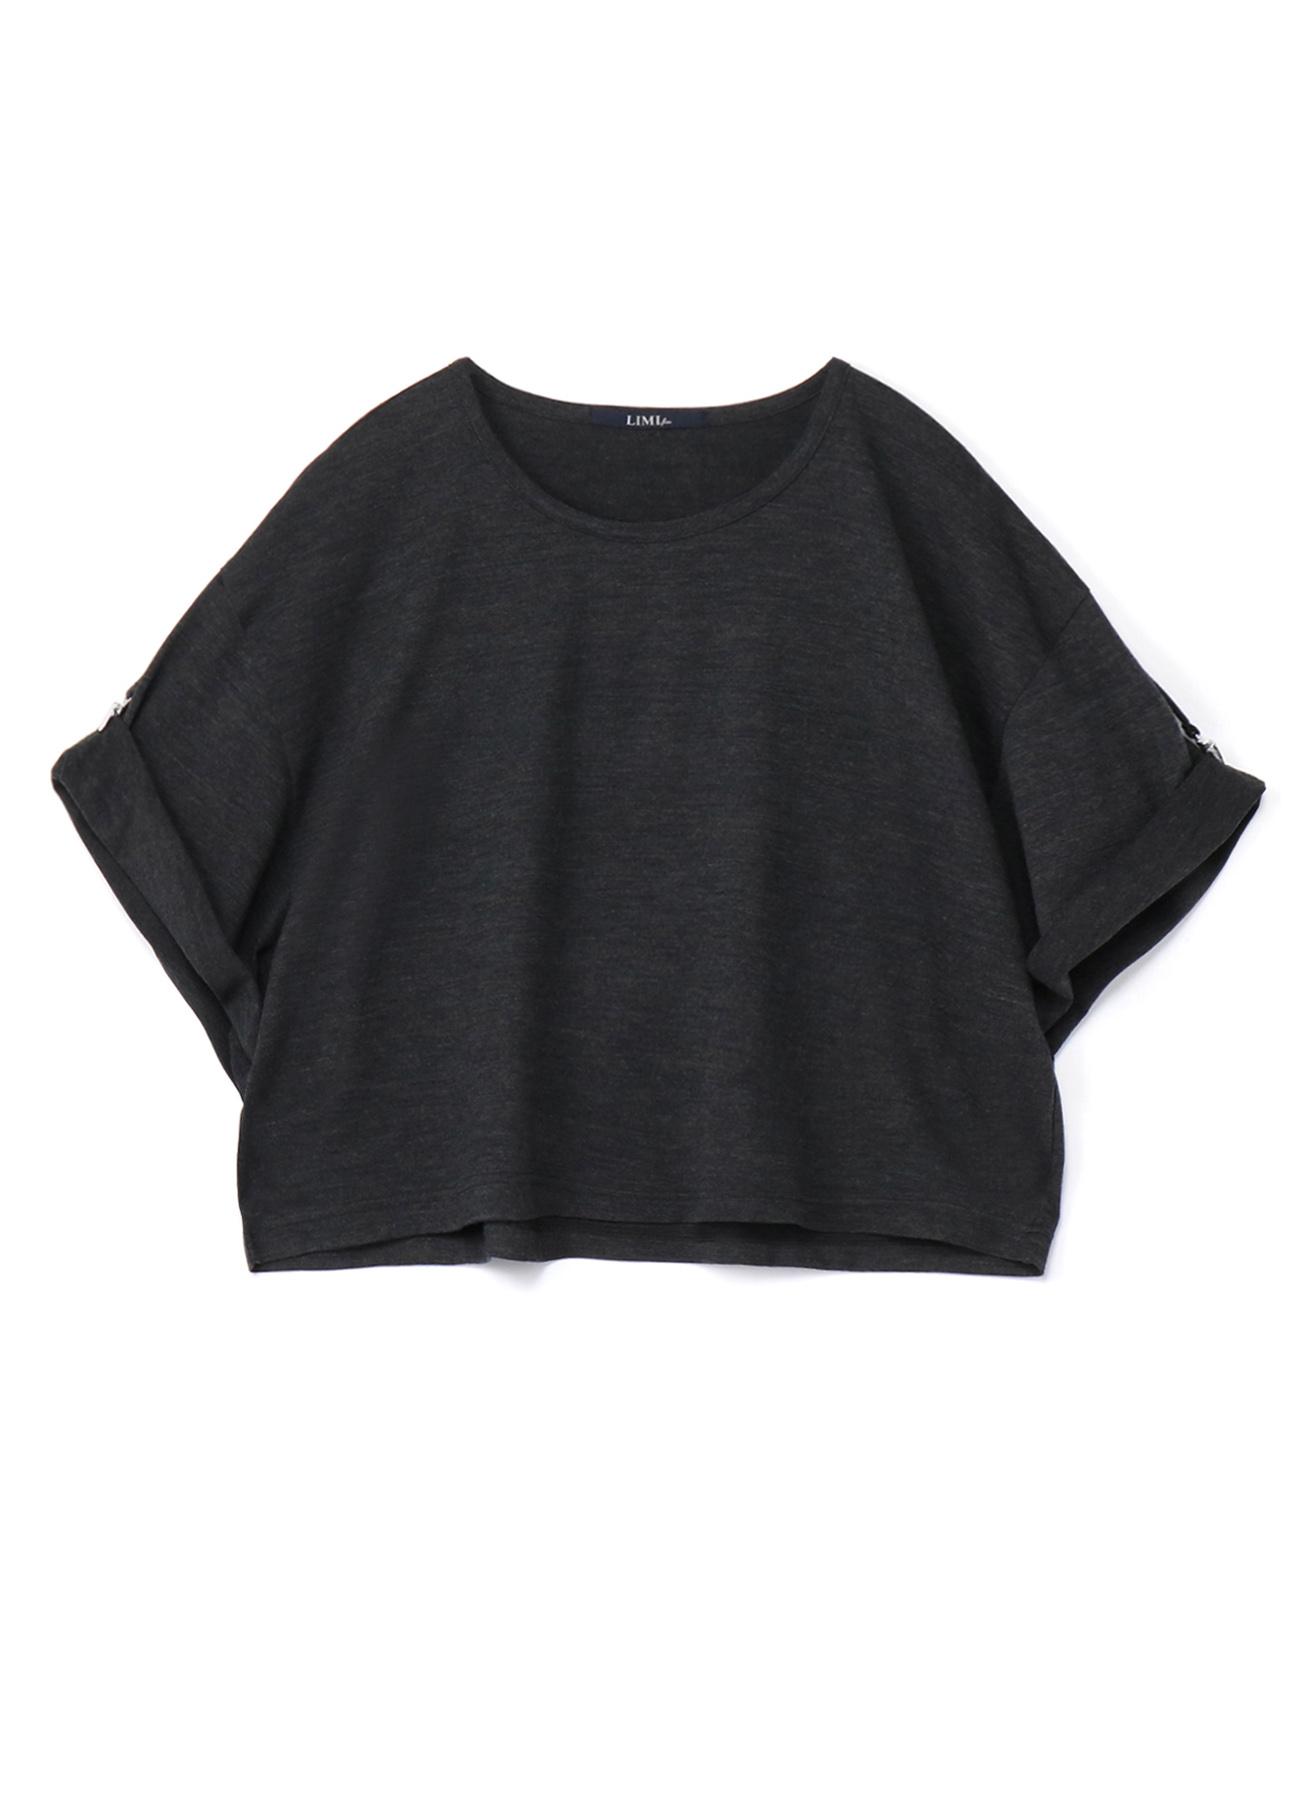 Silky Wool Plain stitch Susupender Half Sleeve T-Shirt